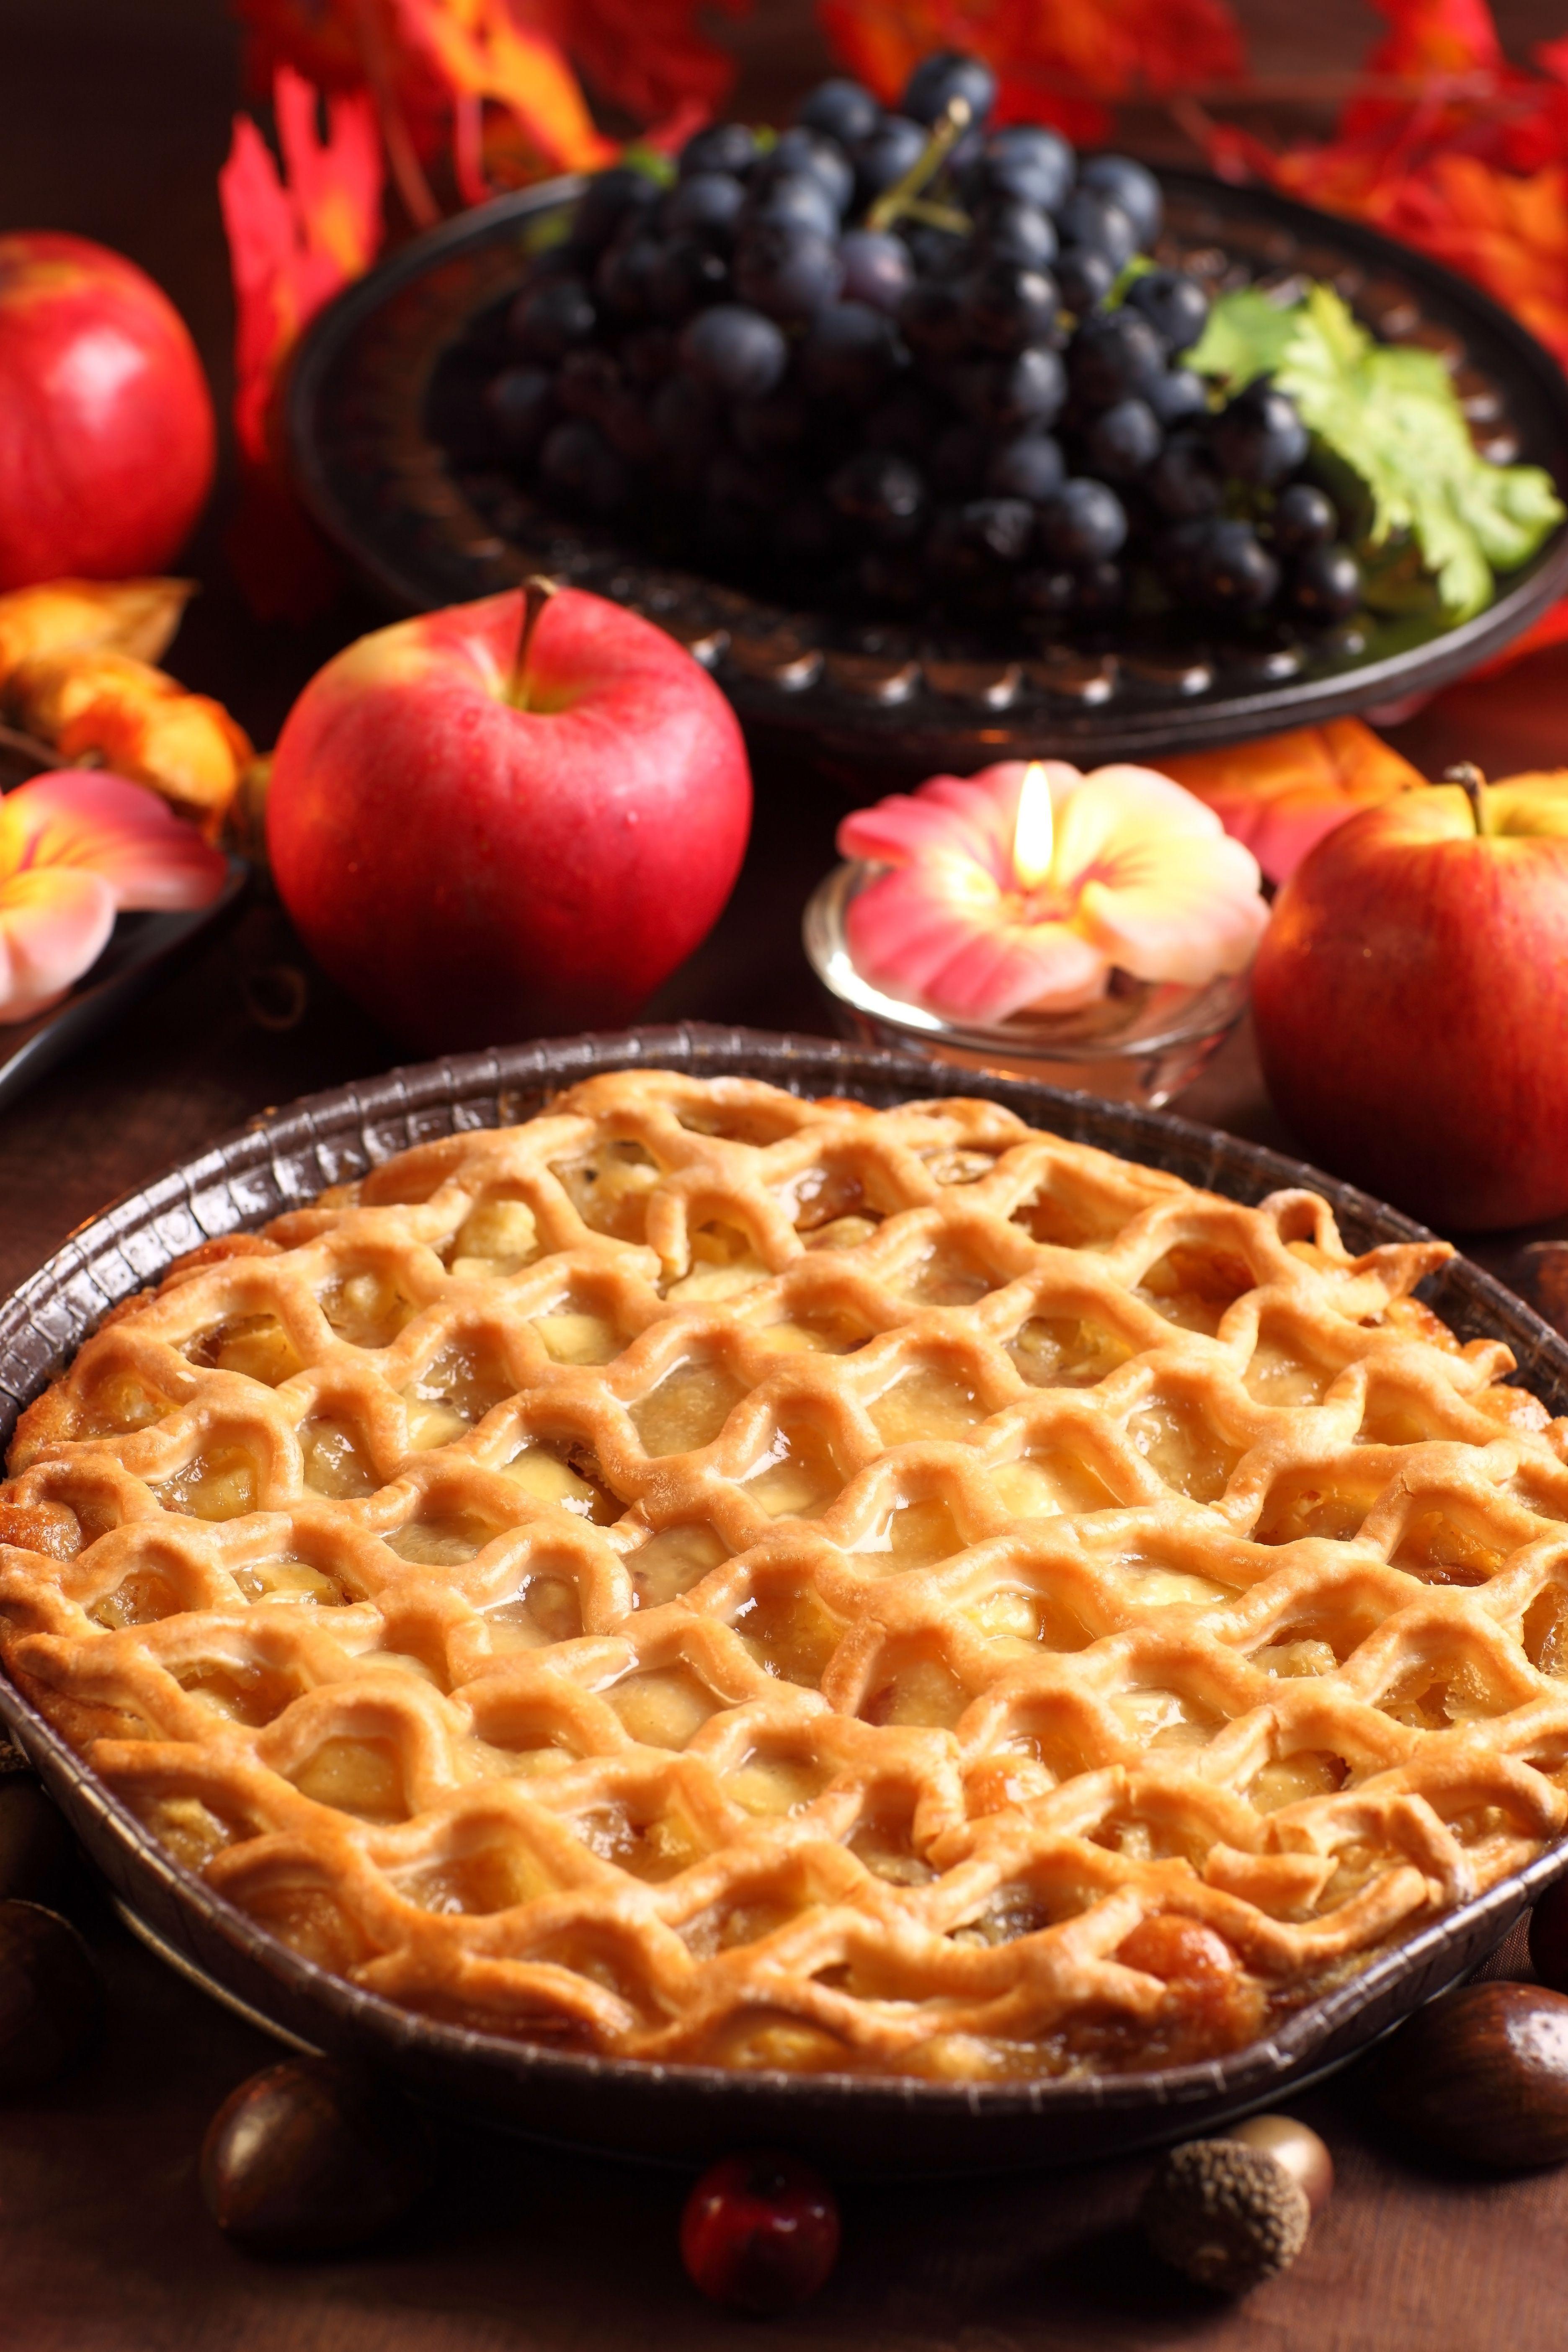 Apple Pie www.teeliesfoodie.com A simple dessert for fall season. #thanksgivingtreat